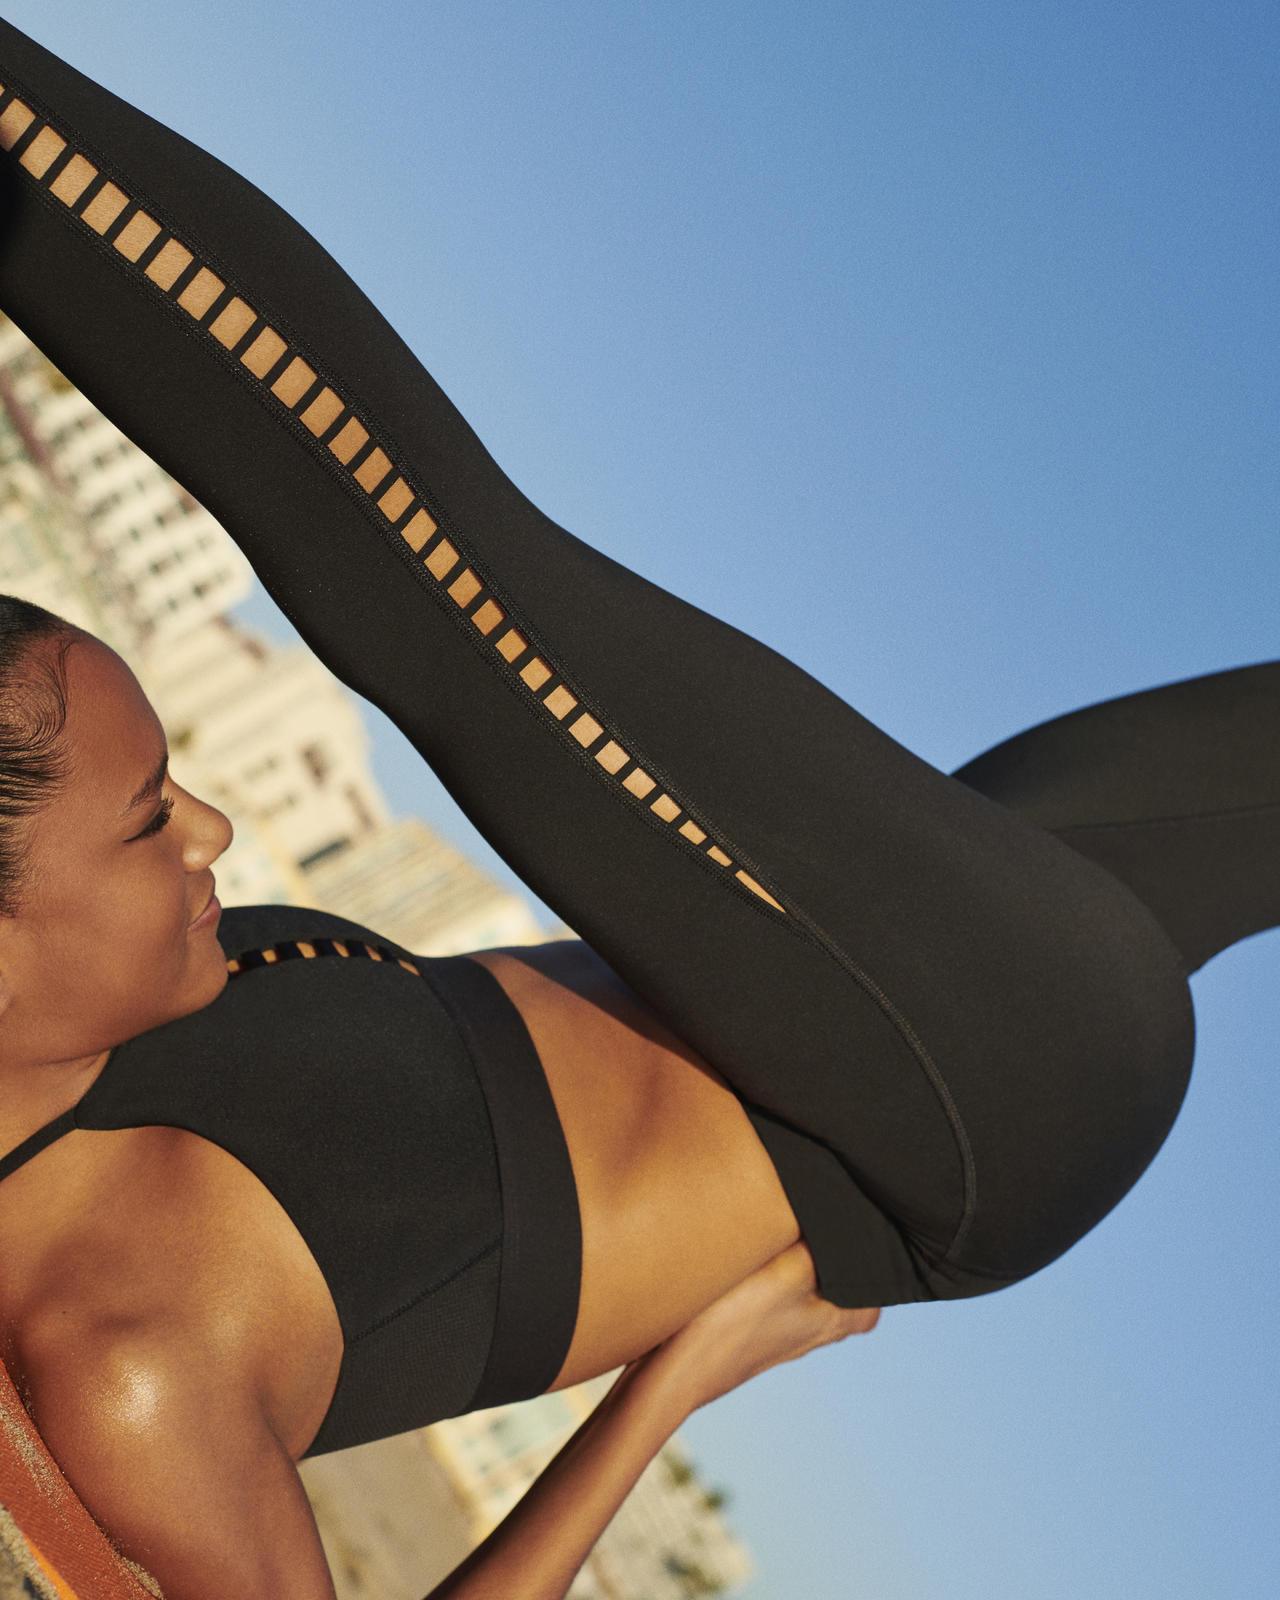 SU19_Nike_Yoga_Collection5_native_1600.jpg